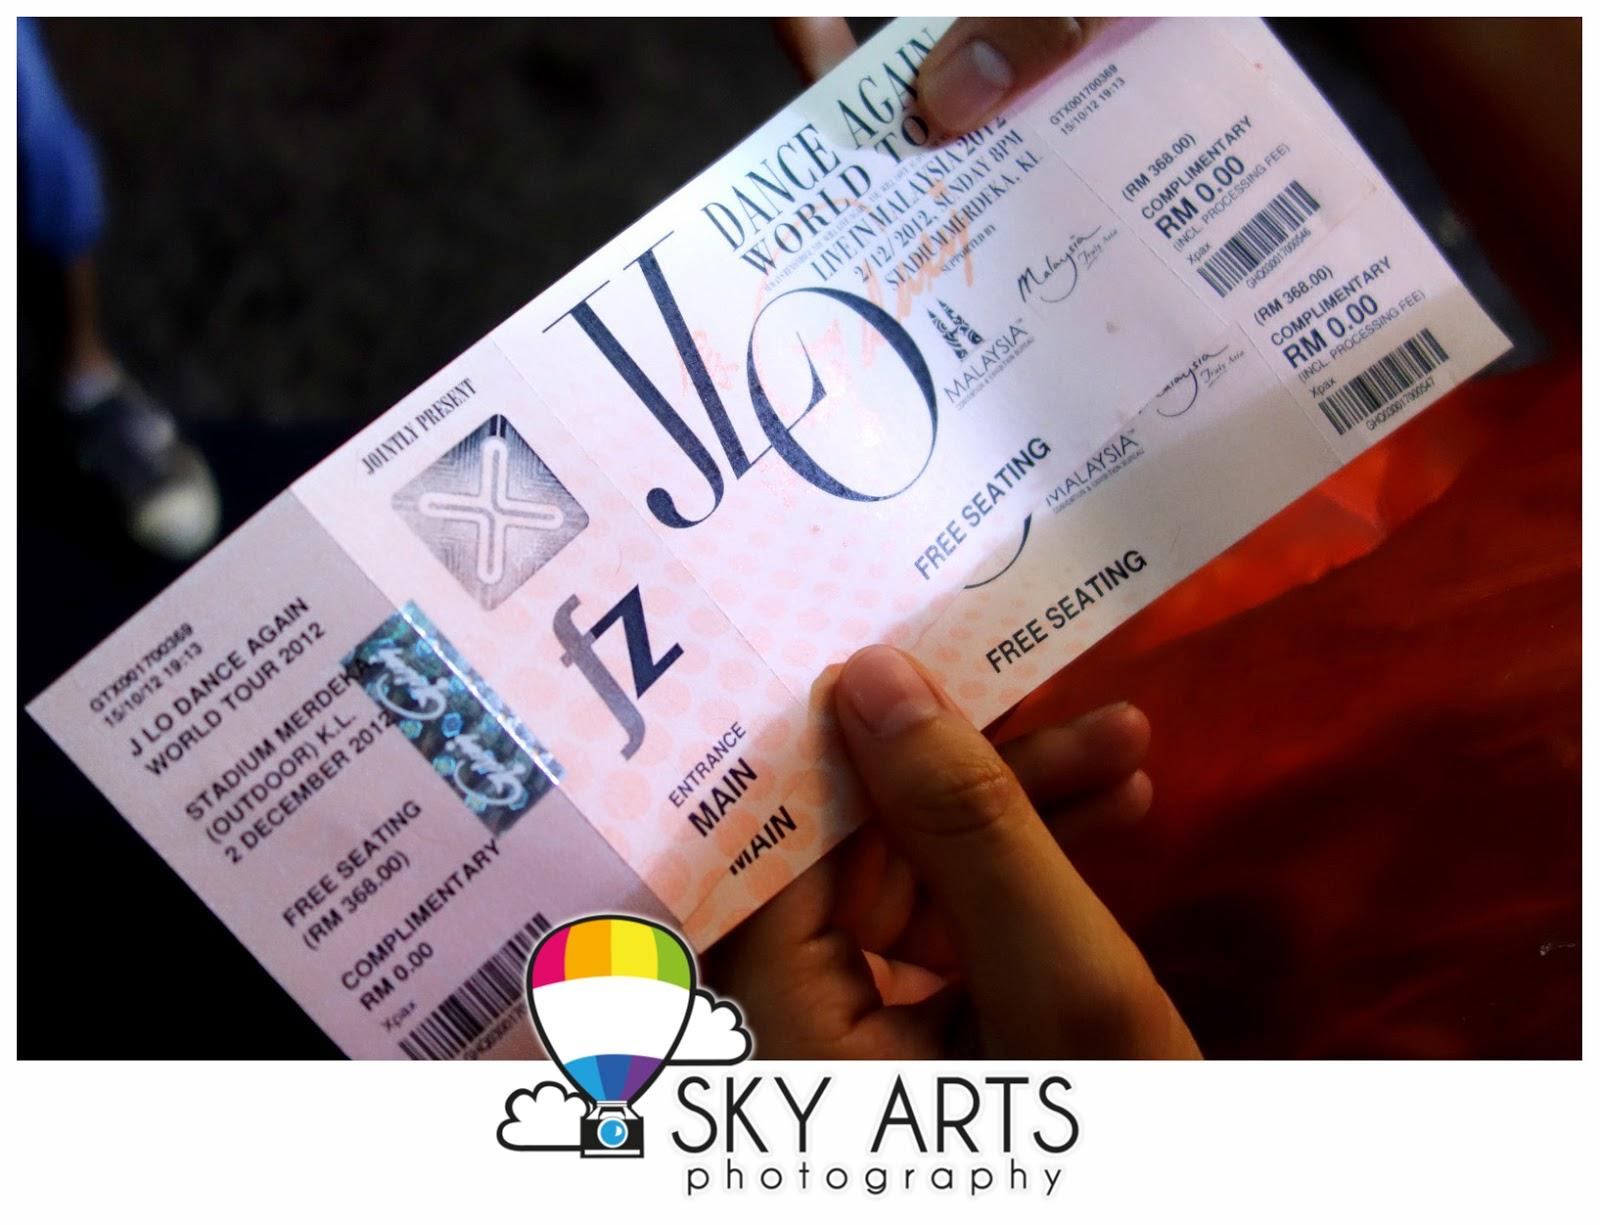 http://4.bp.blogspot.com/-ga7oupJeXQ0/ULwM9ydP1AI/AAAAAAABqn8/VdSW4w37oeA/s1600/Jennifer+Lopez+%23DanceAgainWorldTour2012+Malaysia+Kuala+Lumpur+Live+Concert-00313.jpg